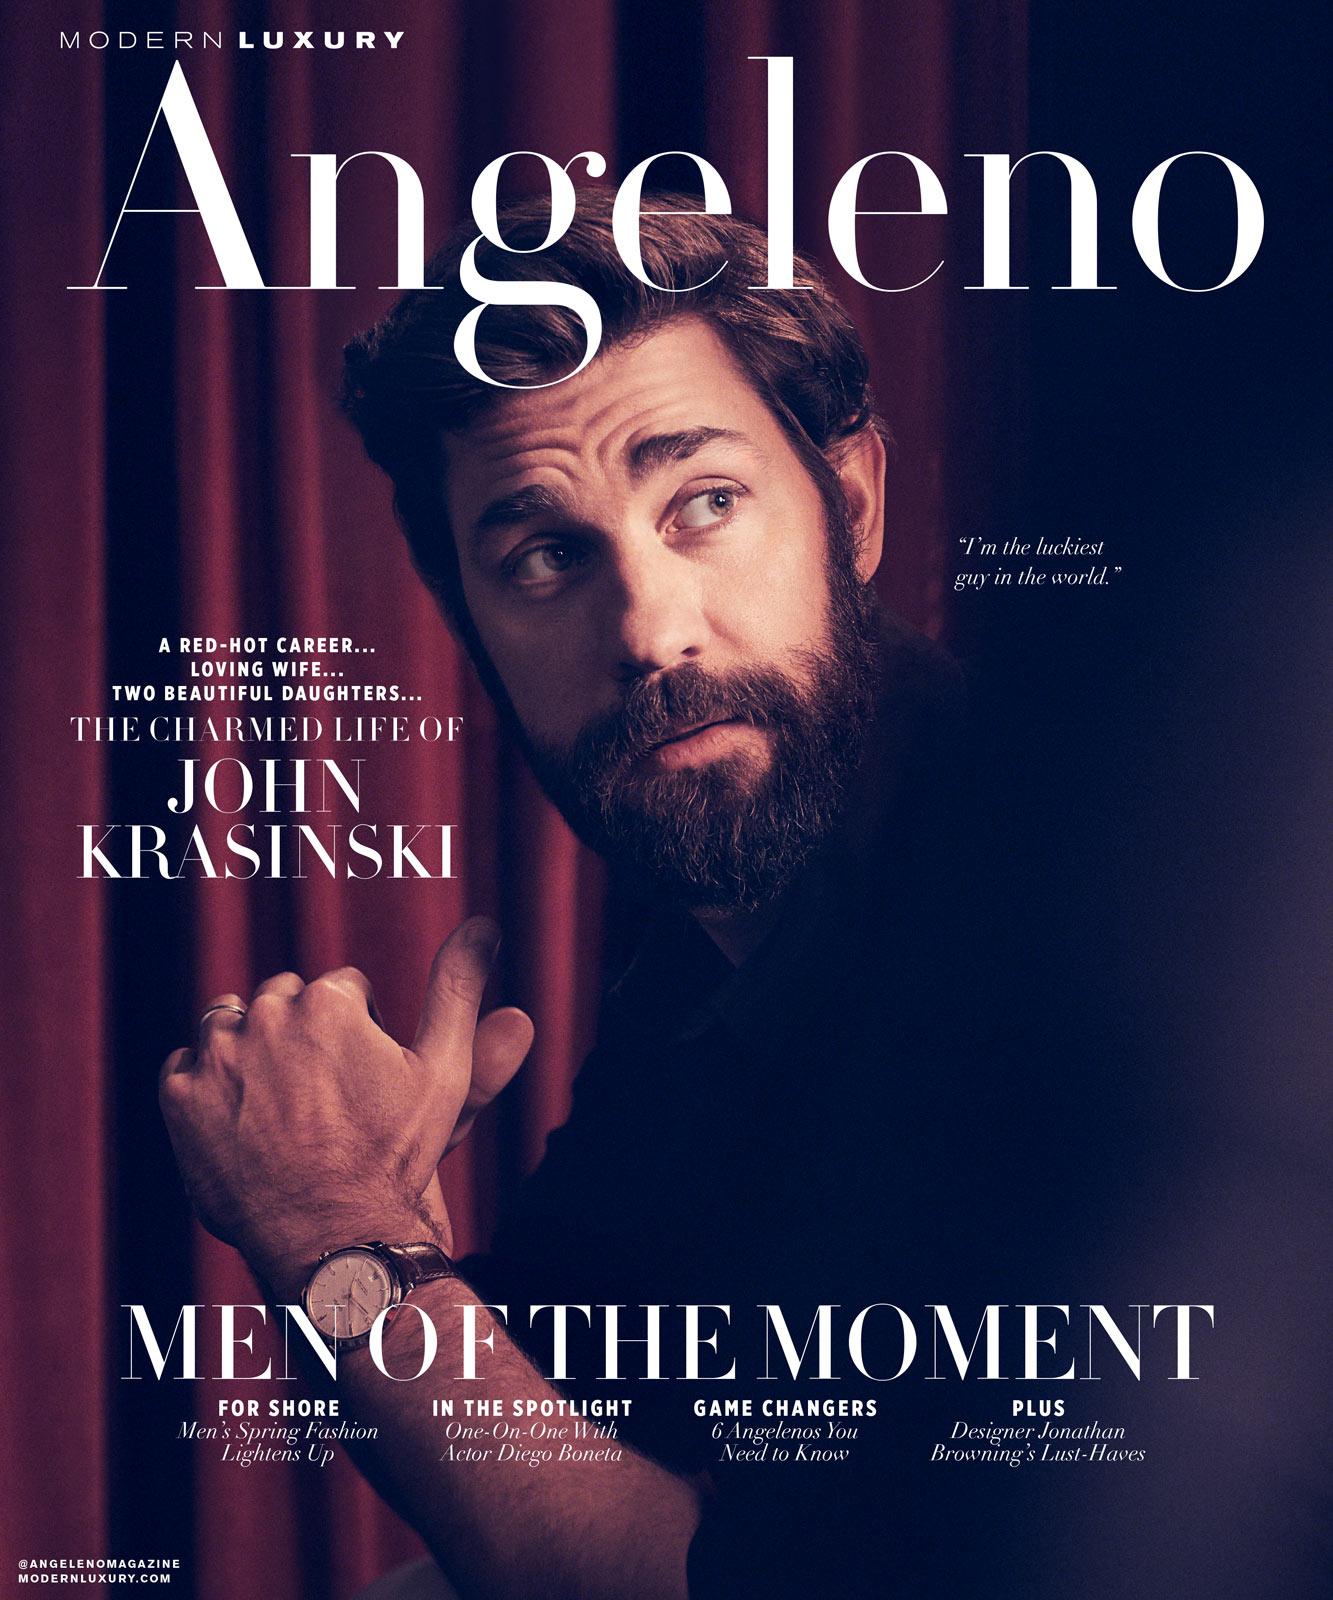 Angeleno Magazine Modern Luxury - Cover - April 2018.jpg